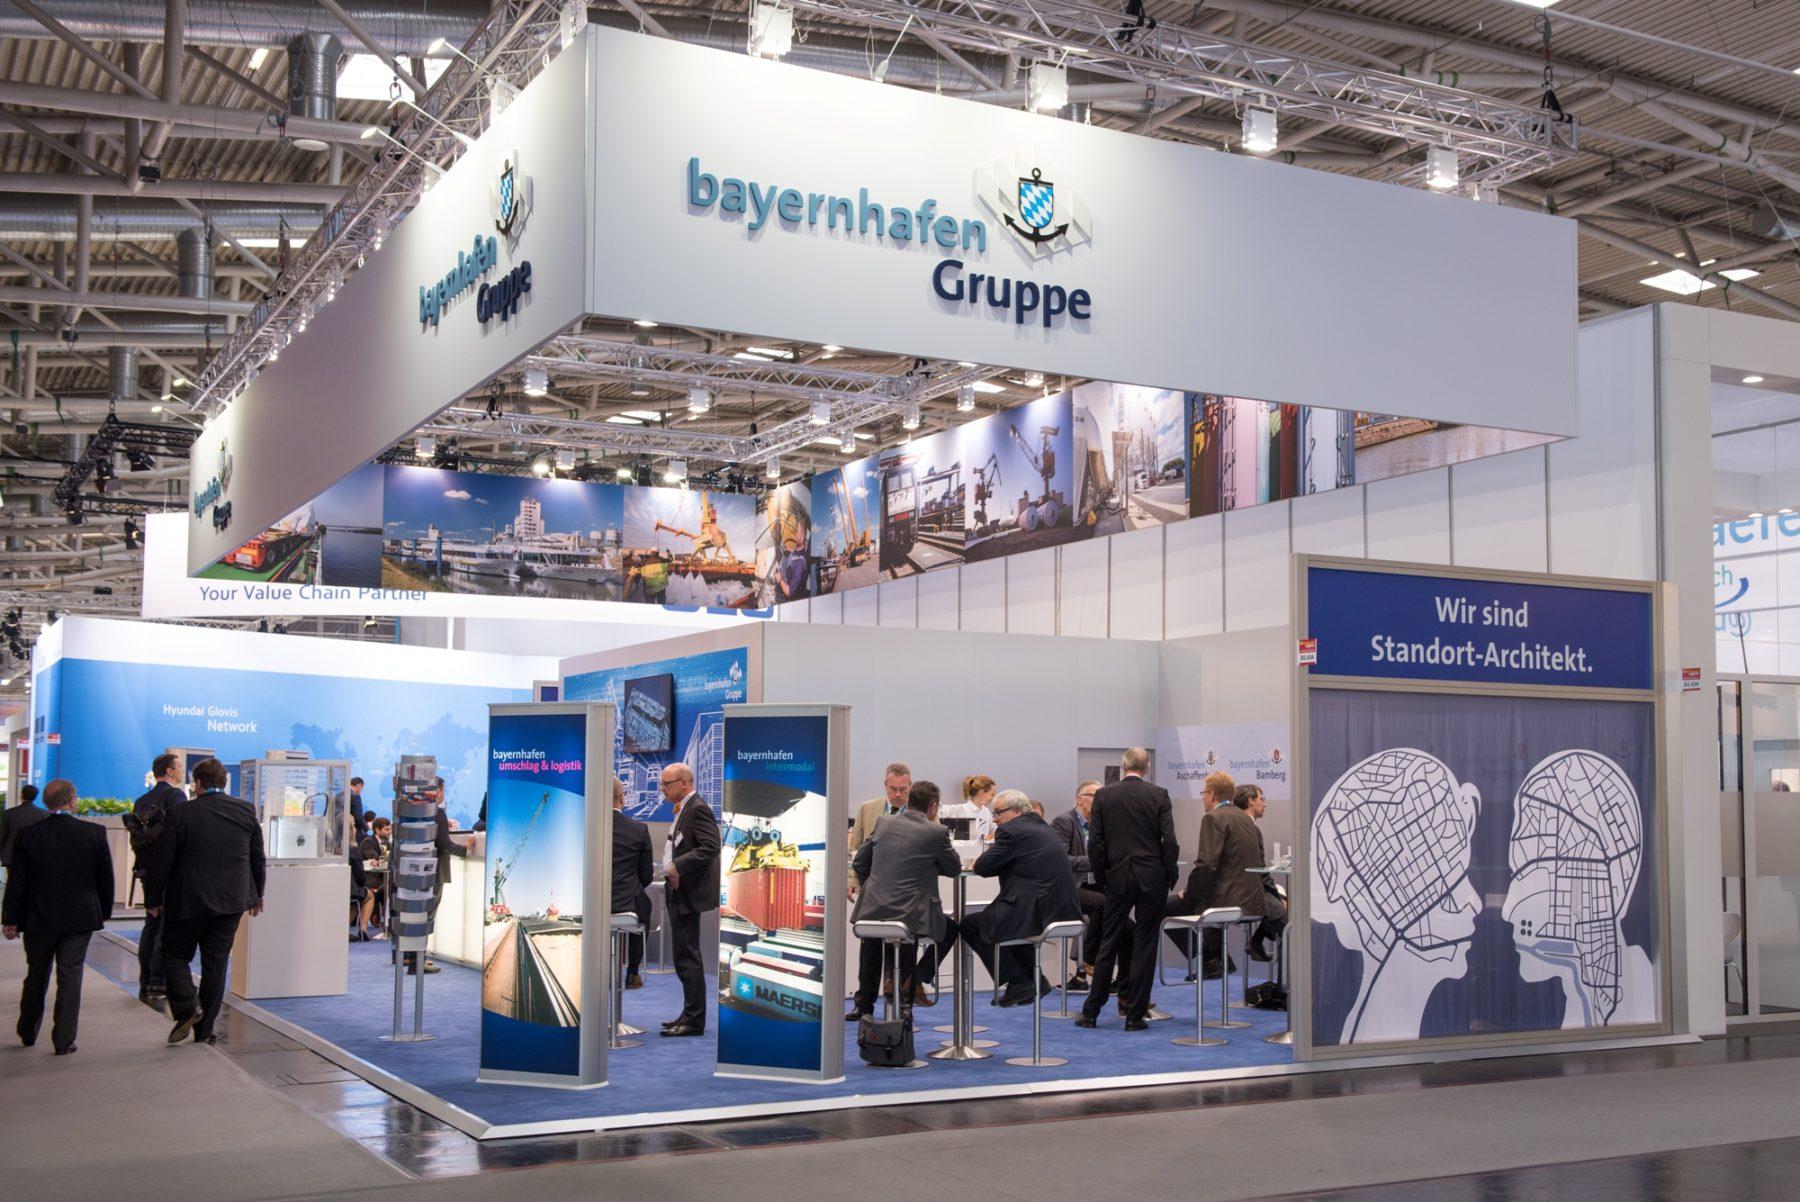 Messestand tranport logistic 2017 bayernhafen